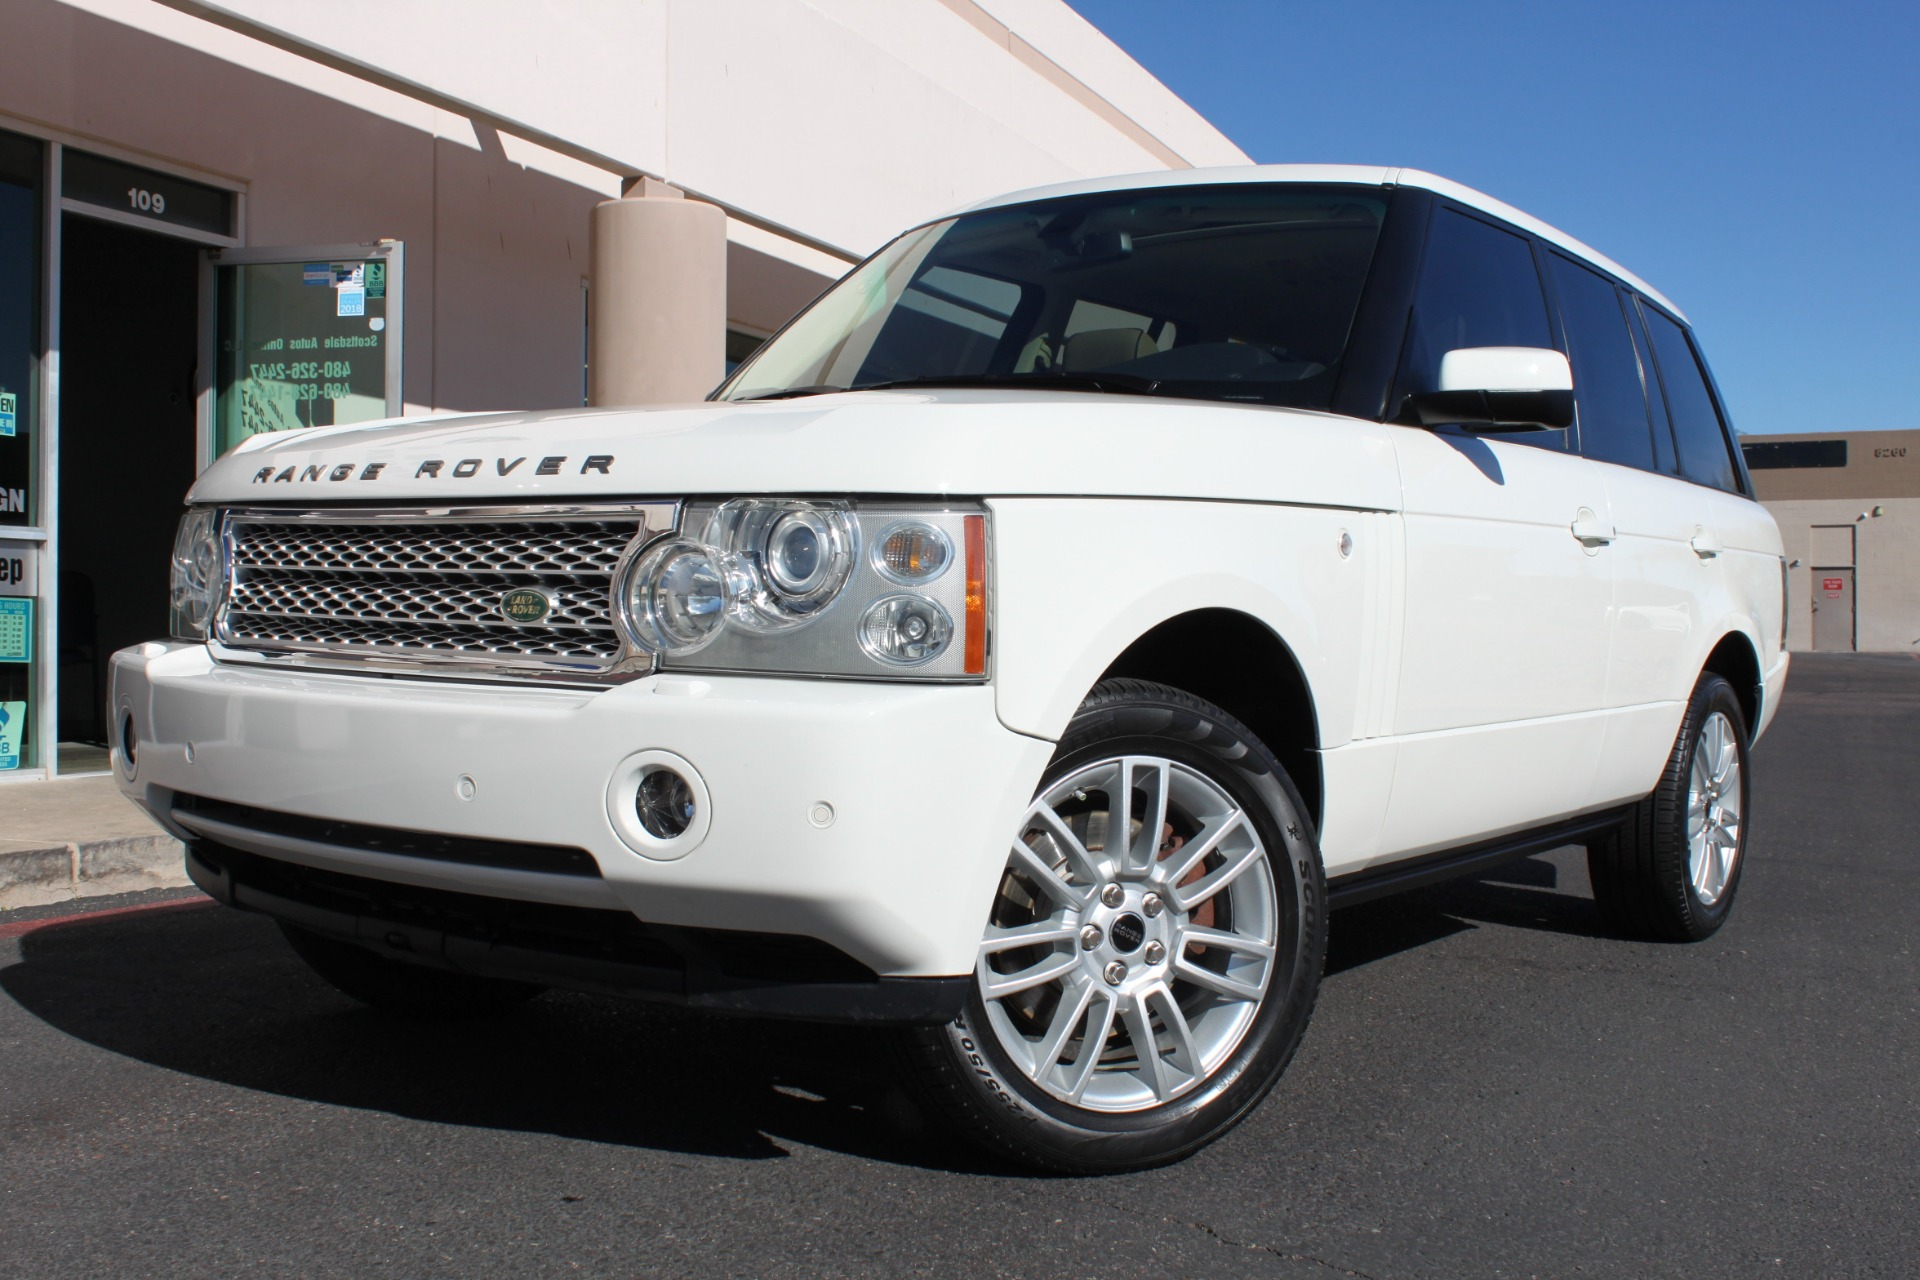 Used 2007 Land Rover Range Rover <span>HSE</span> | Scottsdale, AZ